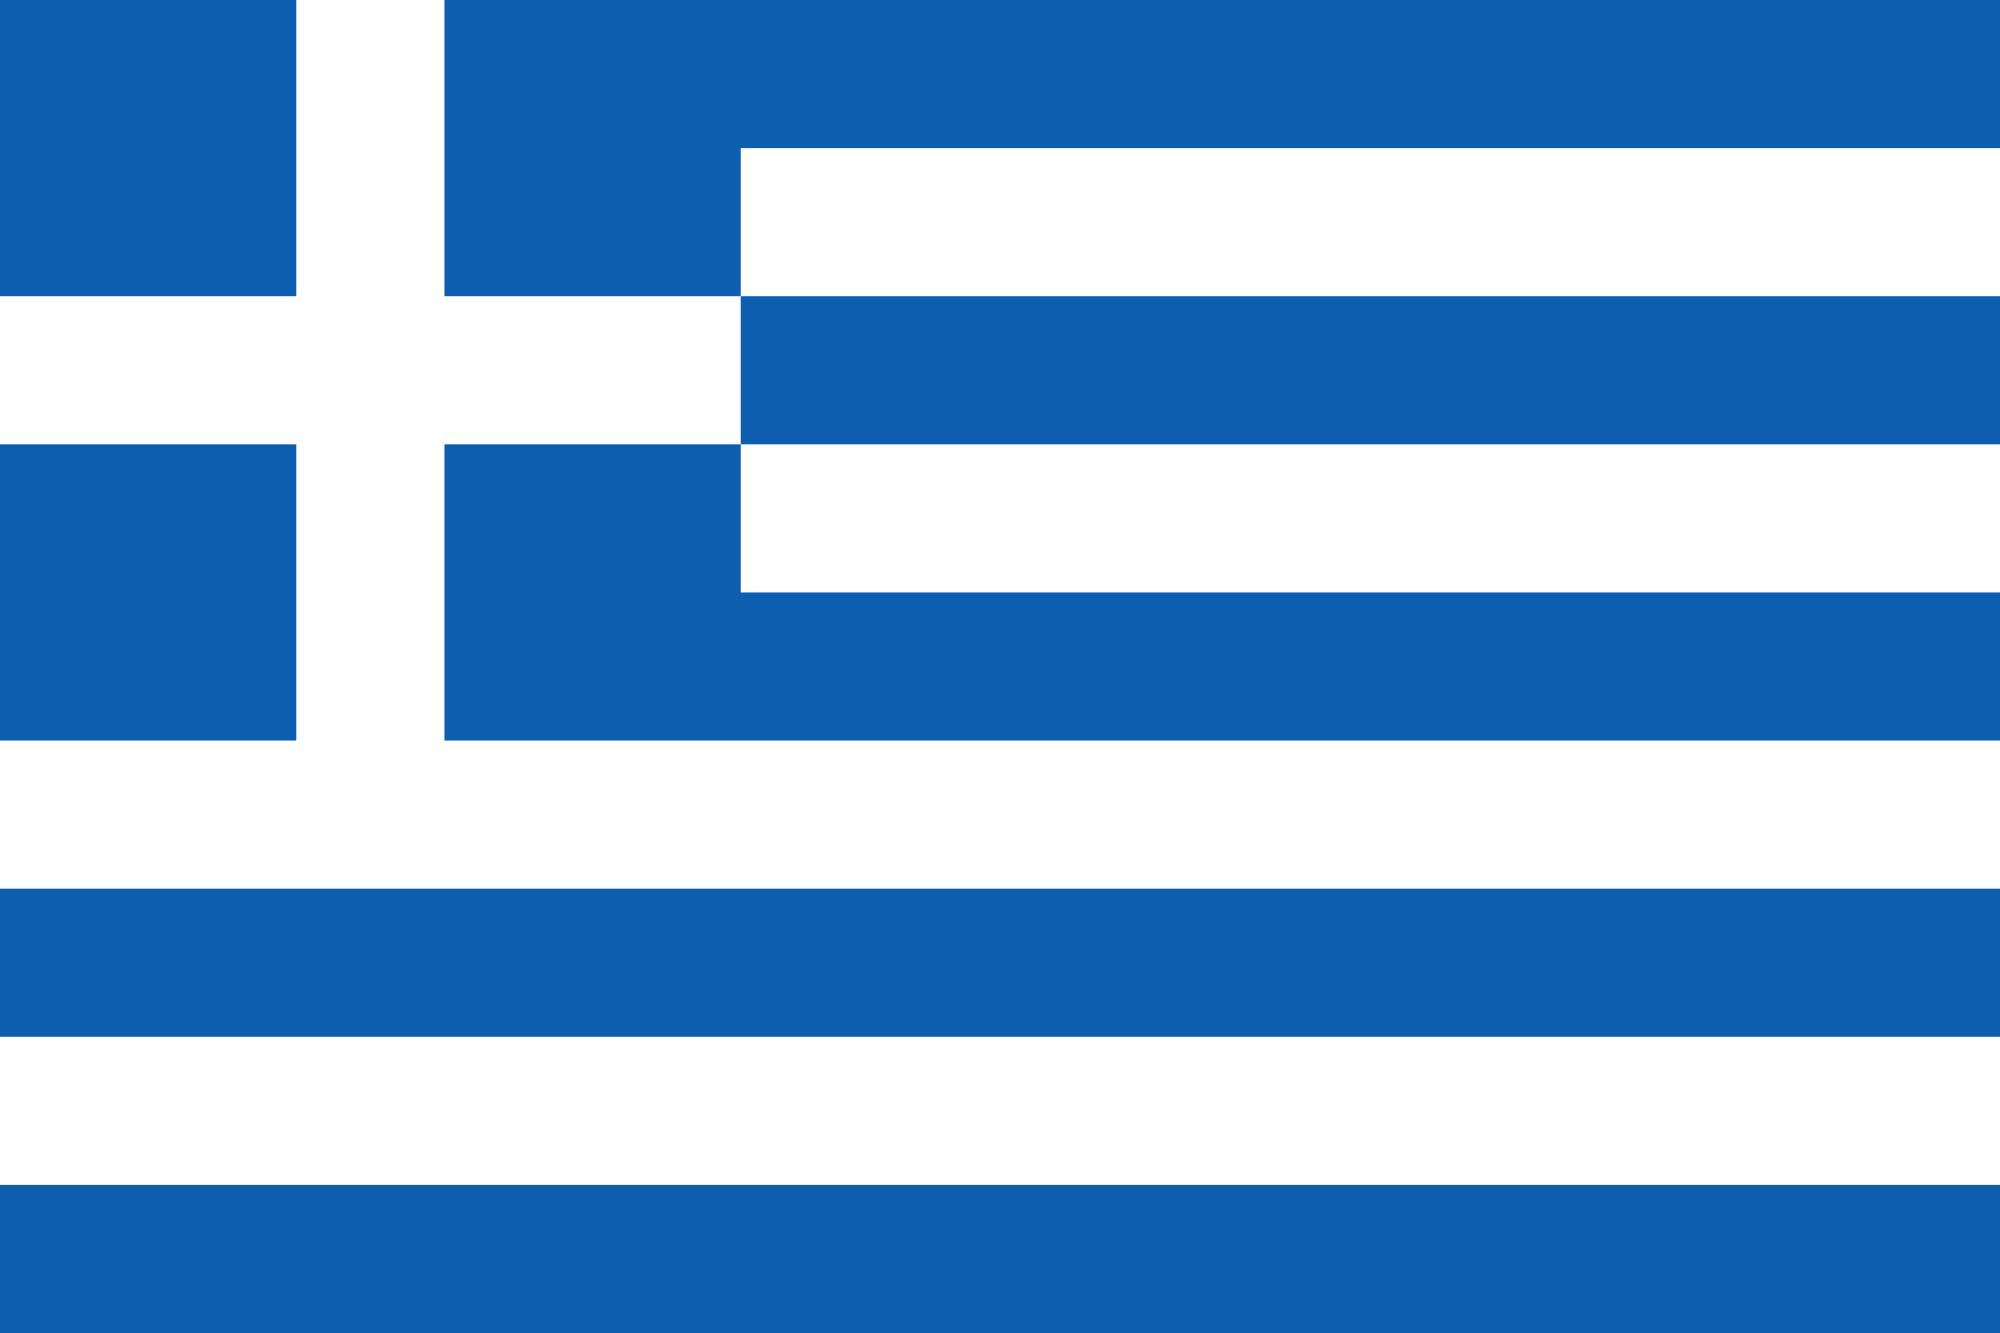 Flag of Greece - Wikipedia